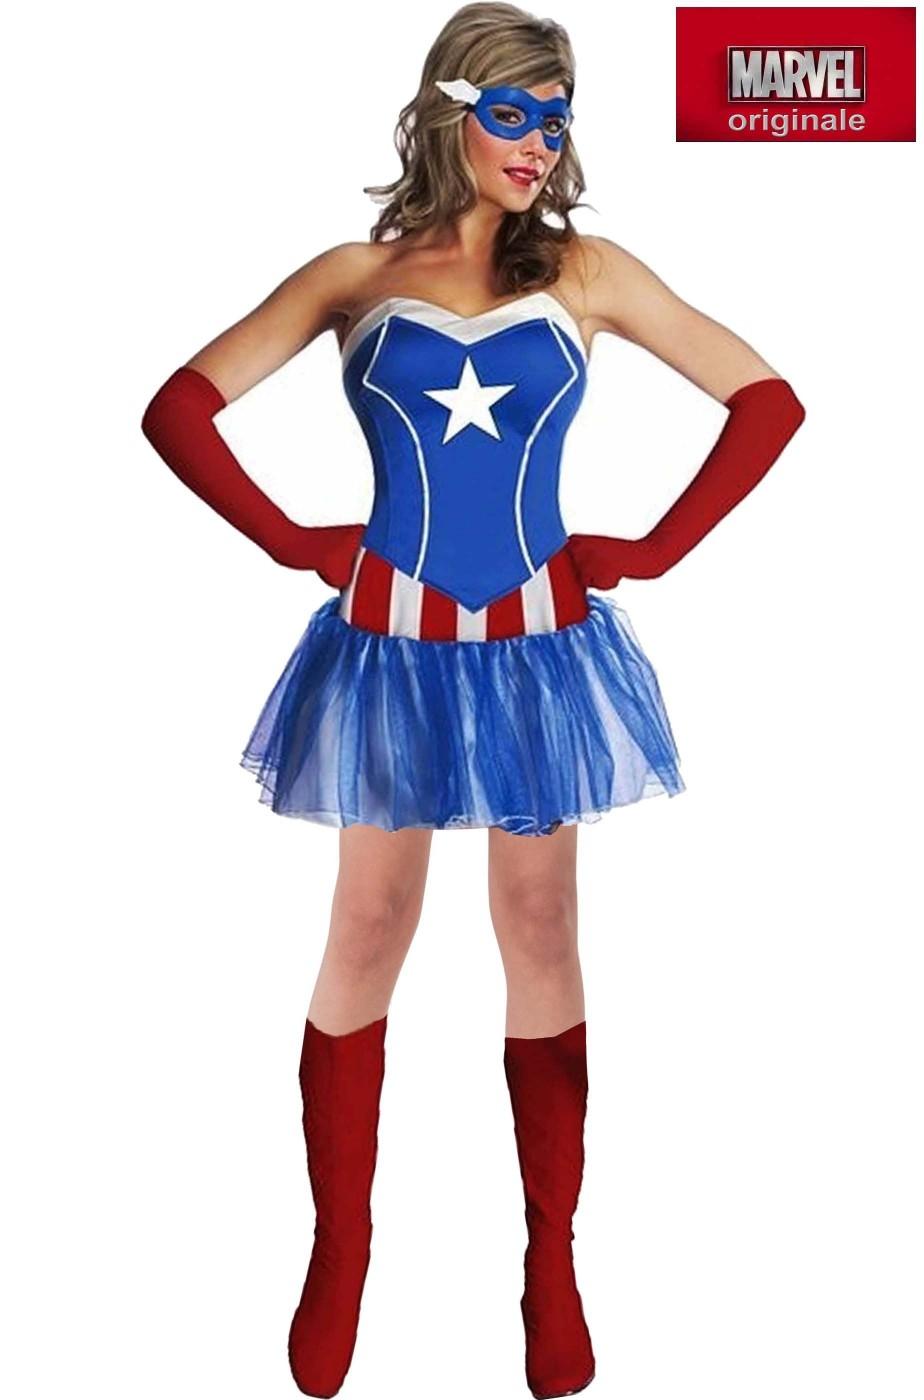 Costume Capitan America da donna The Avengers Marvel